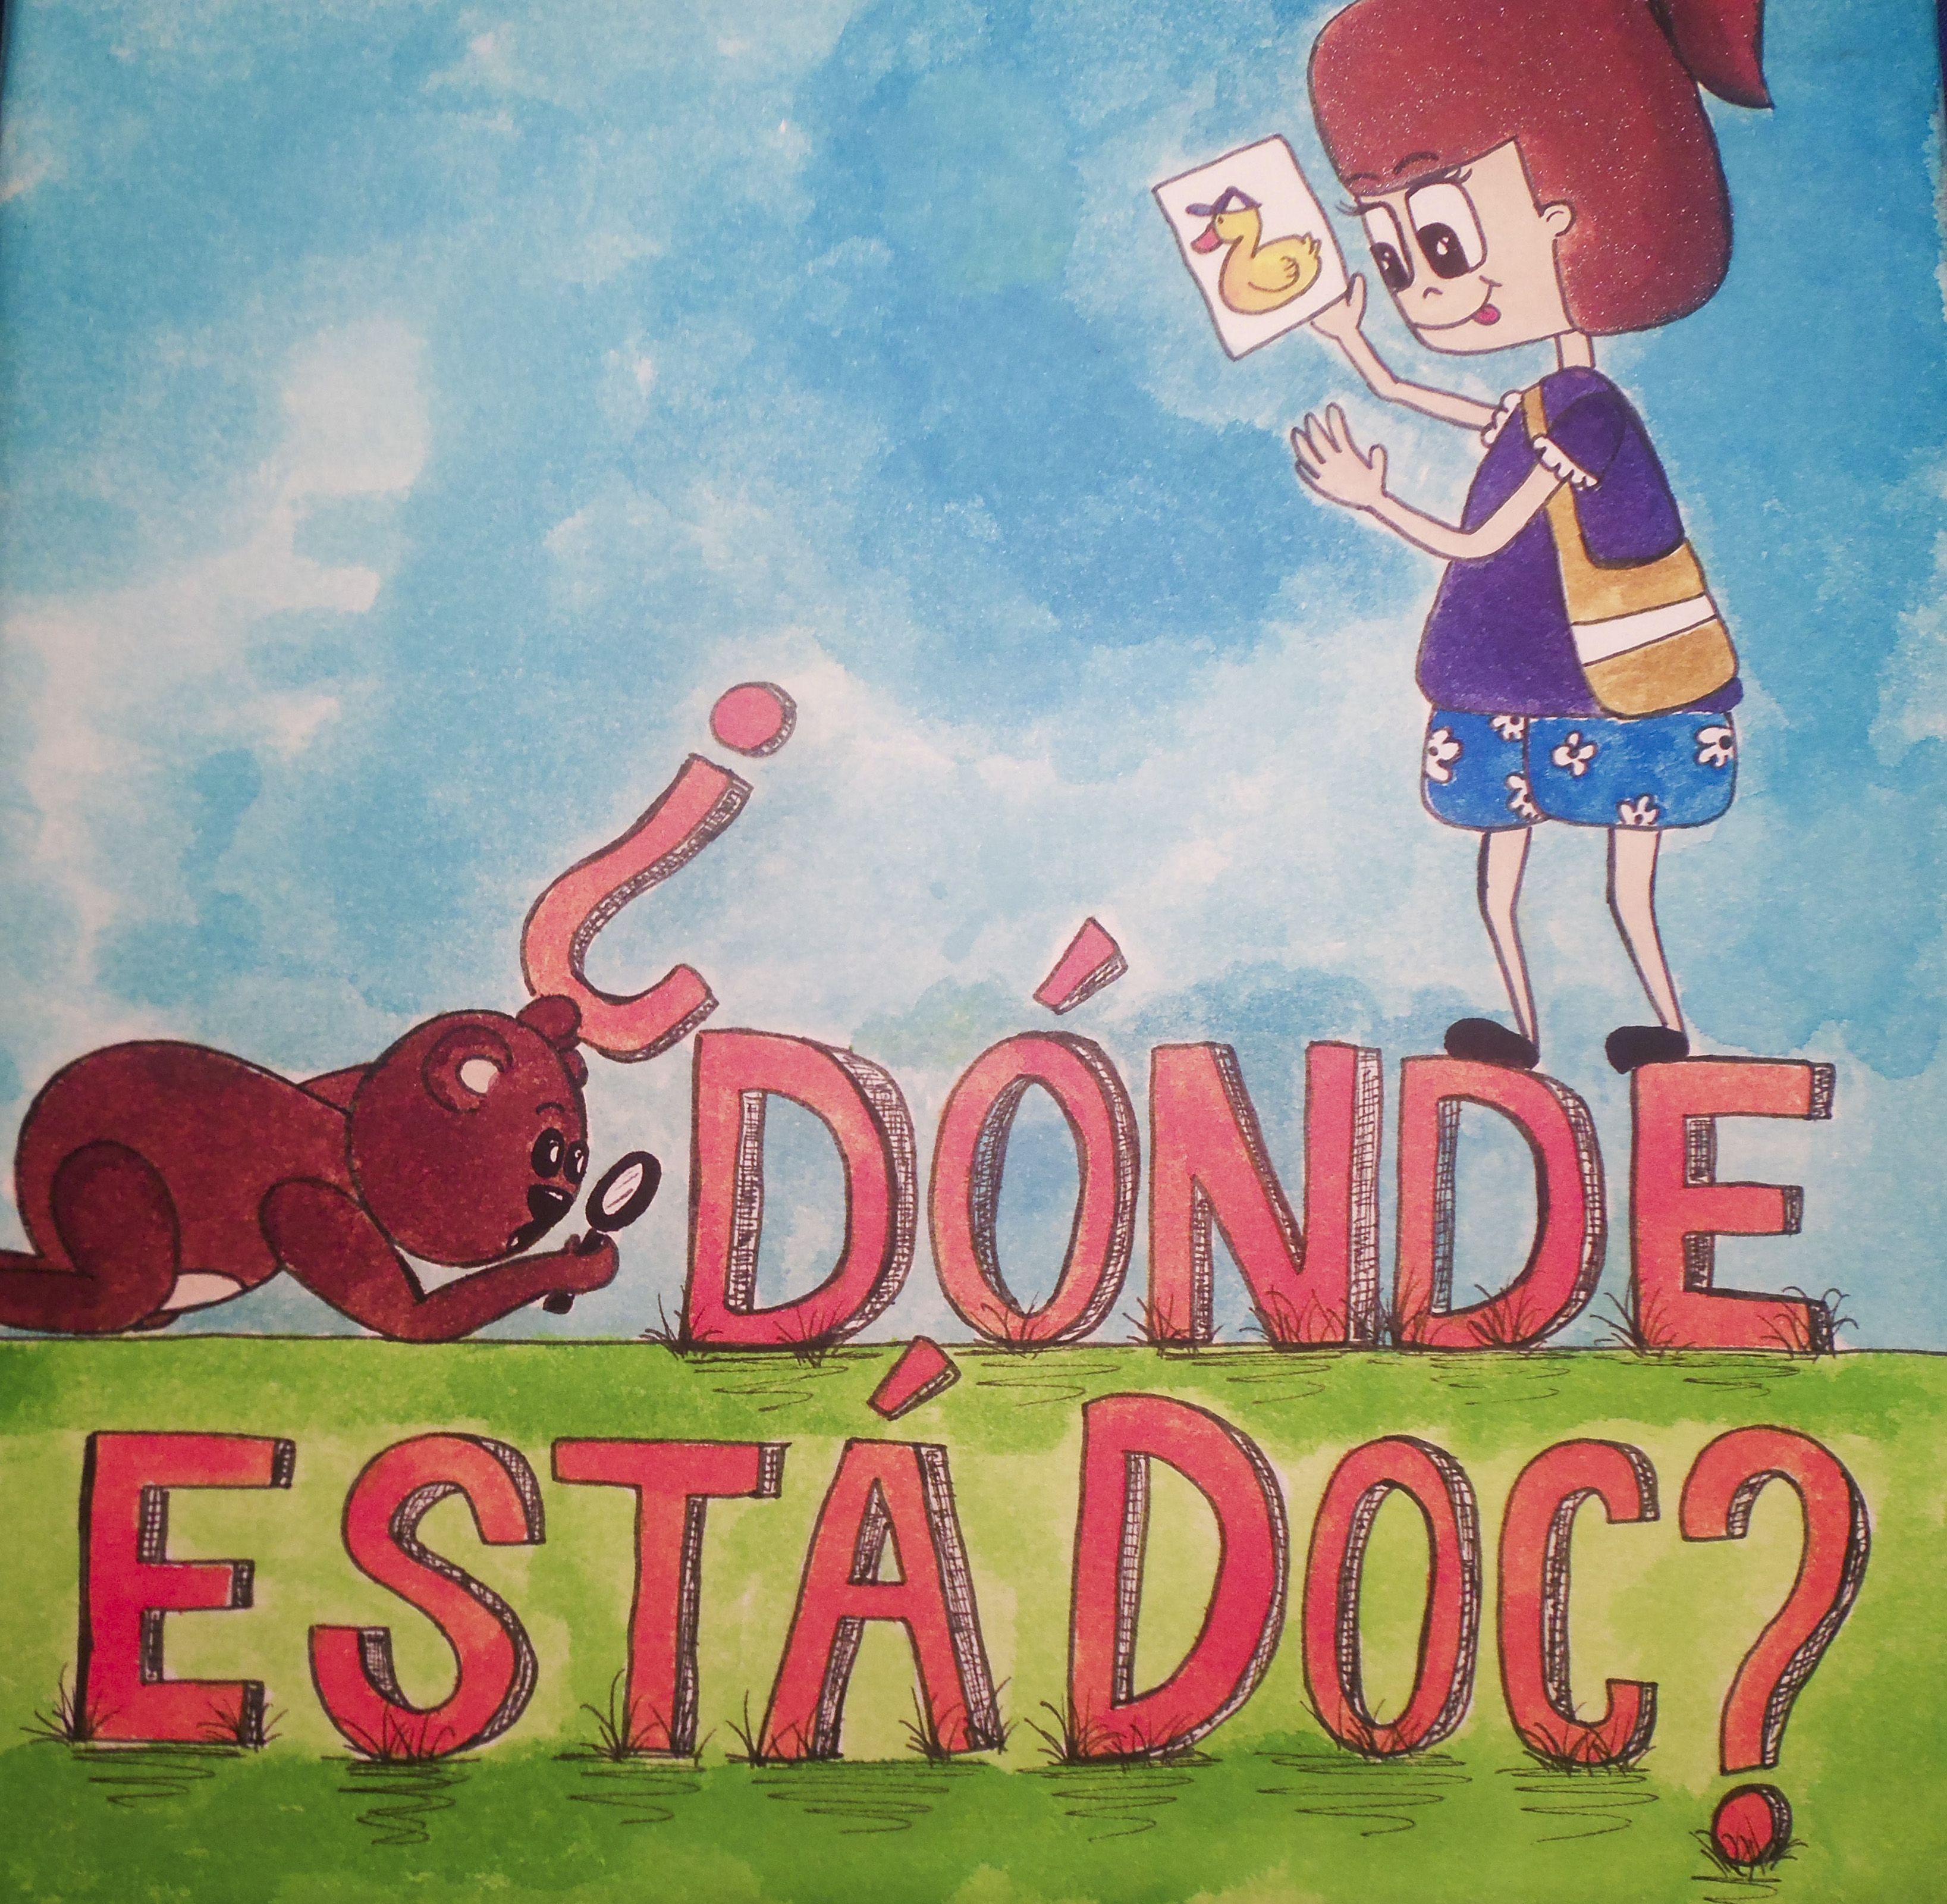 Portada de libro ilustrado ¿Dónde está Doc?